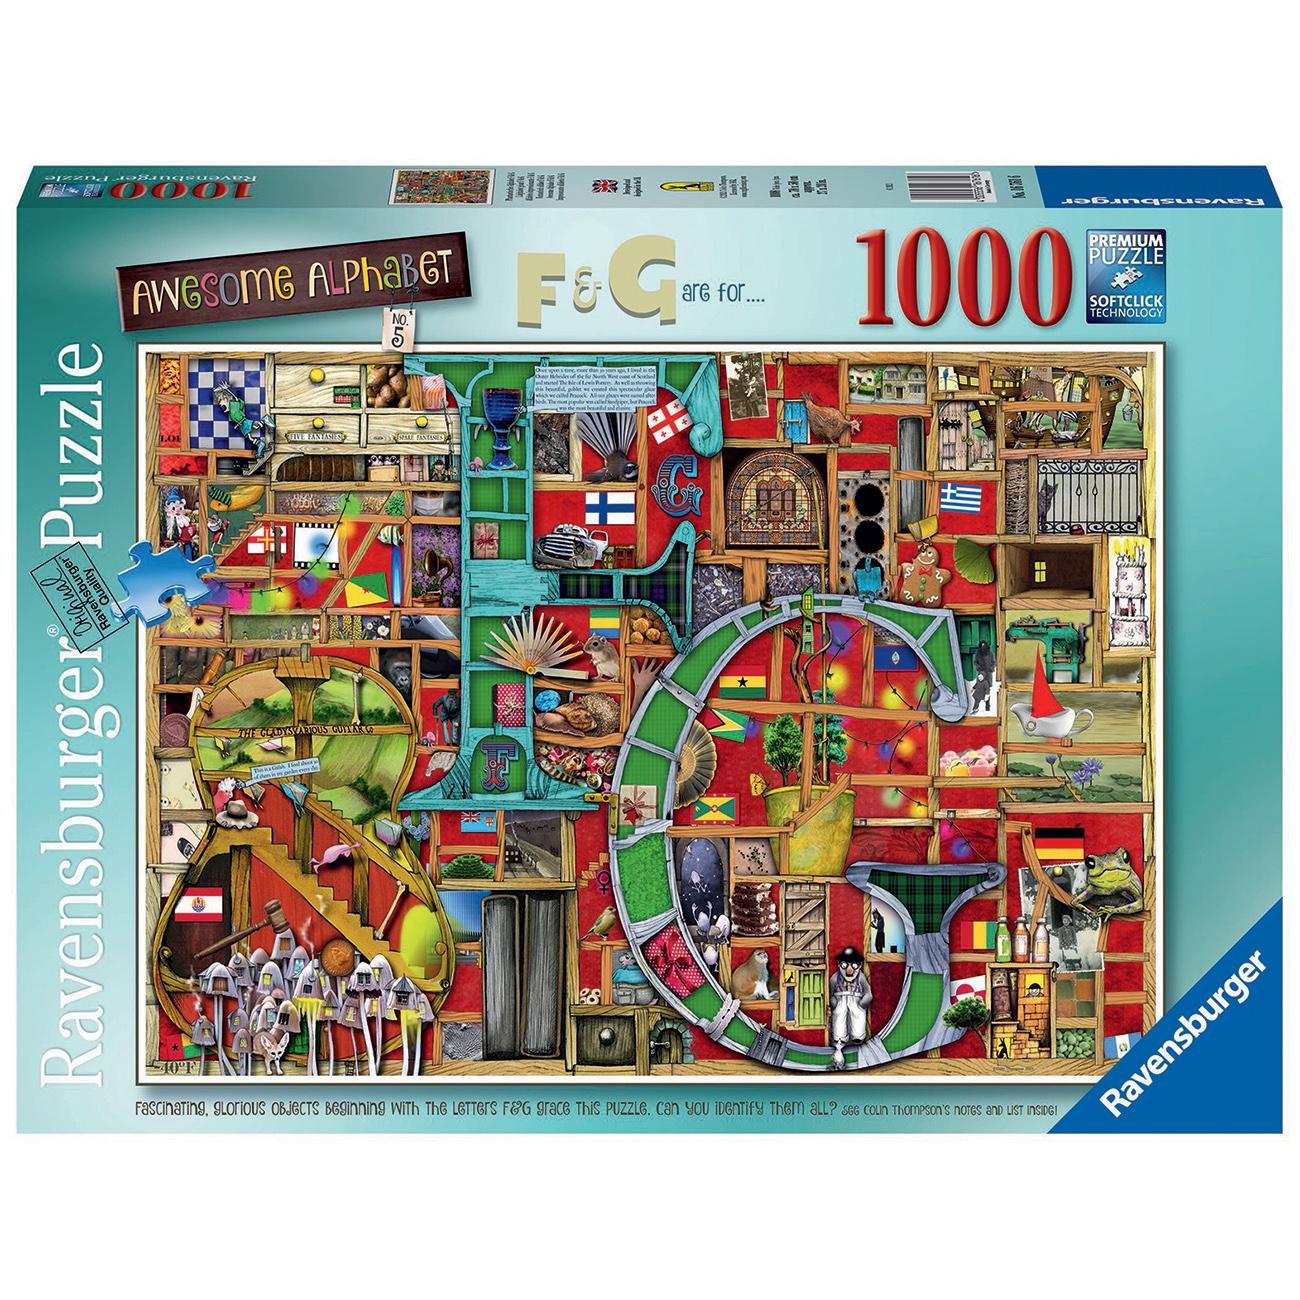 PUZZLE ALFABET COLIN THOMPSON, 1000 PIESE